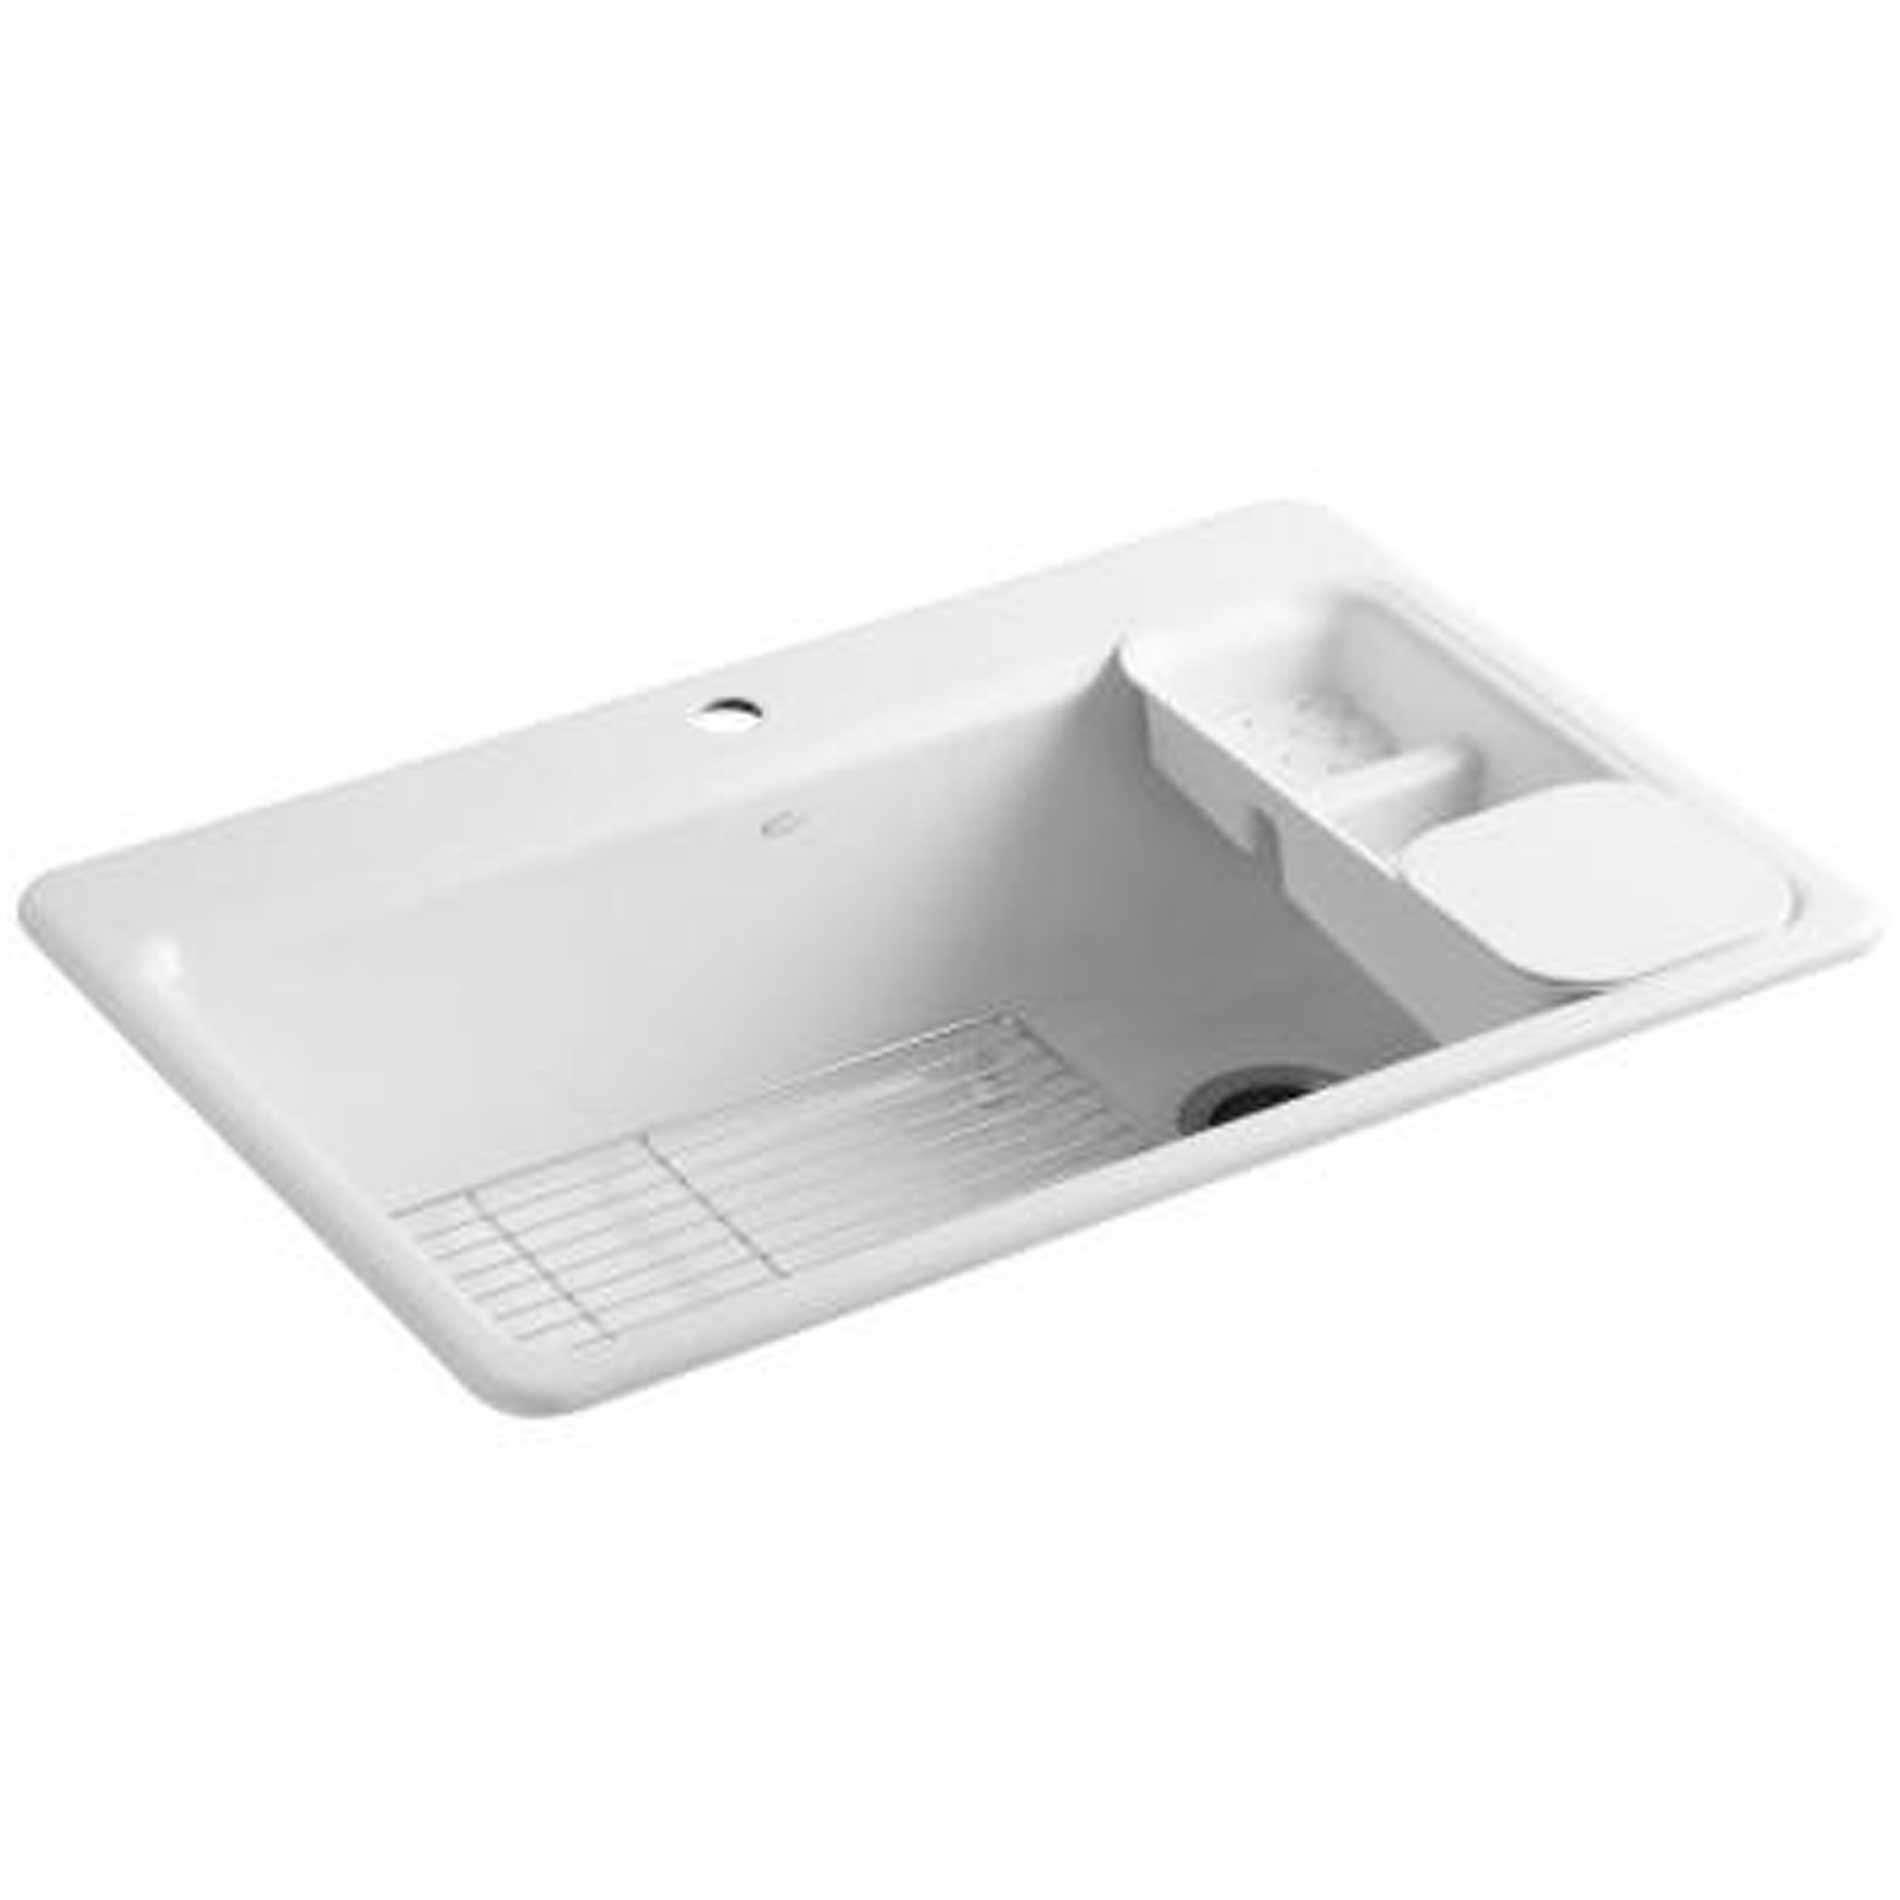 Kitchen Sinks & Taps - Kohler: Riverby 5871 Inset Cast Iron Sink